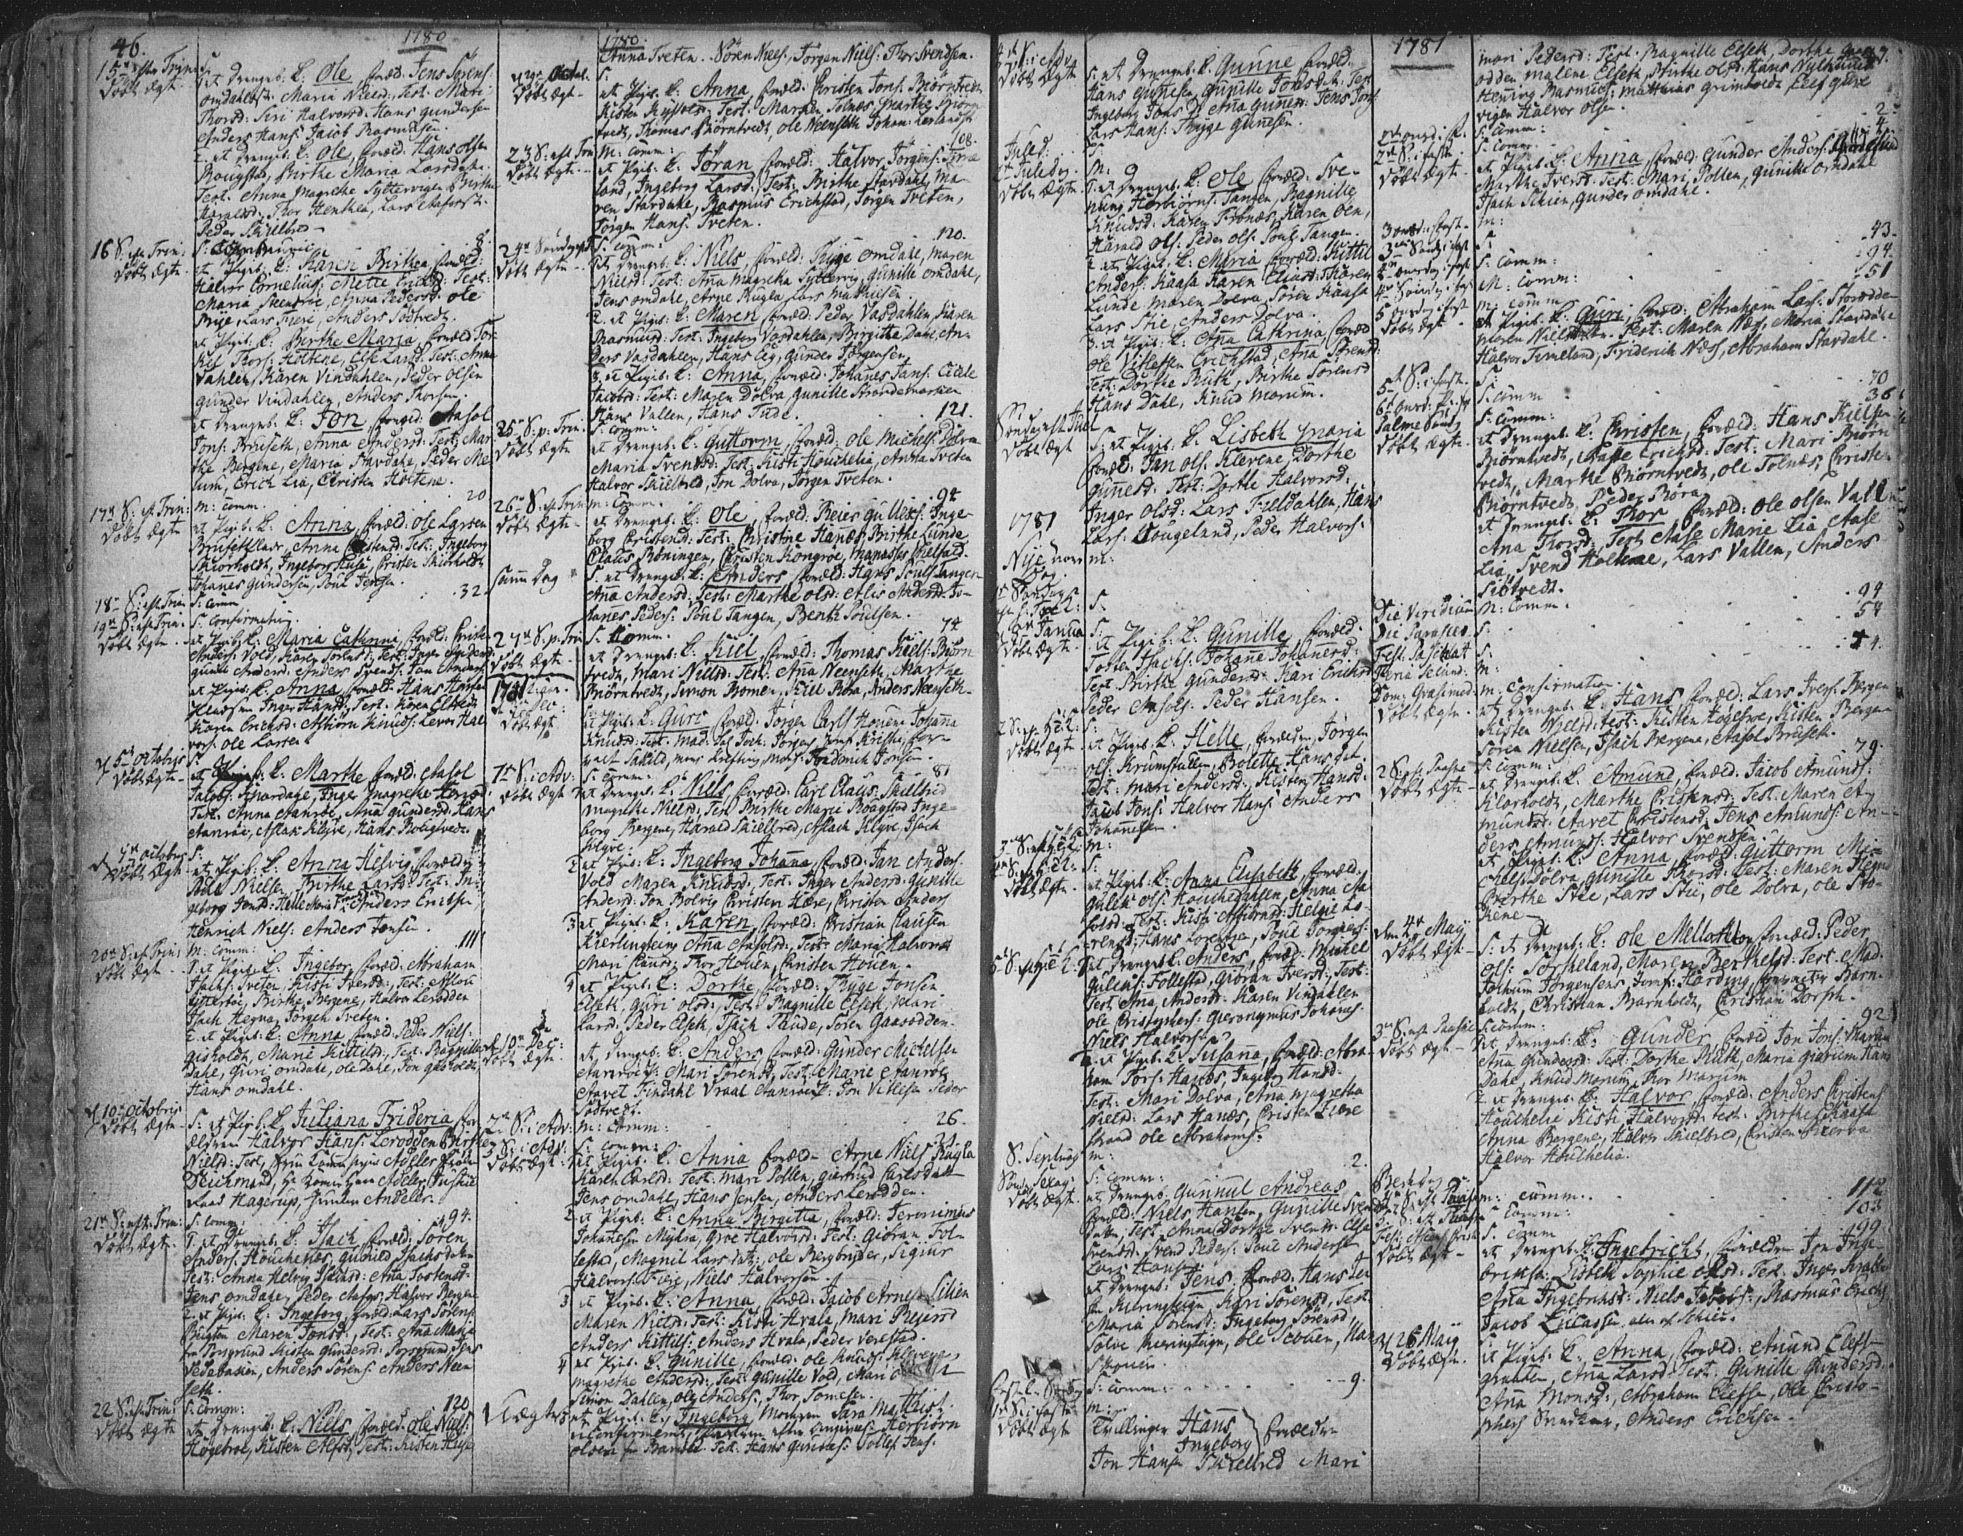 SAKO, Solum kirkebøker, F/Fa/L0003: Ministerialbok nr. I 3, 1761-1814, s. 46-47